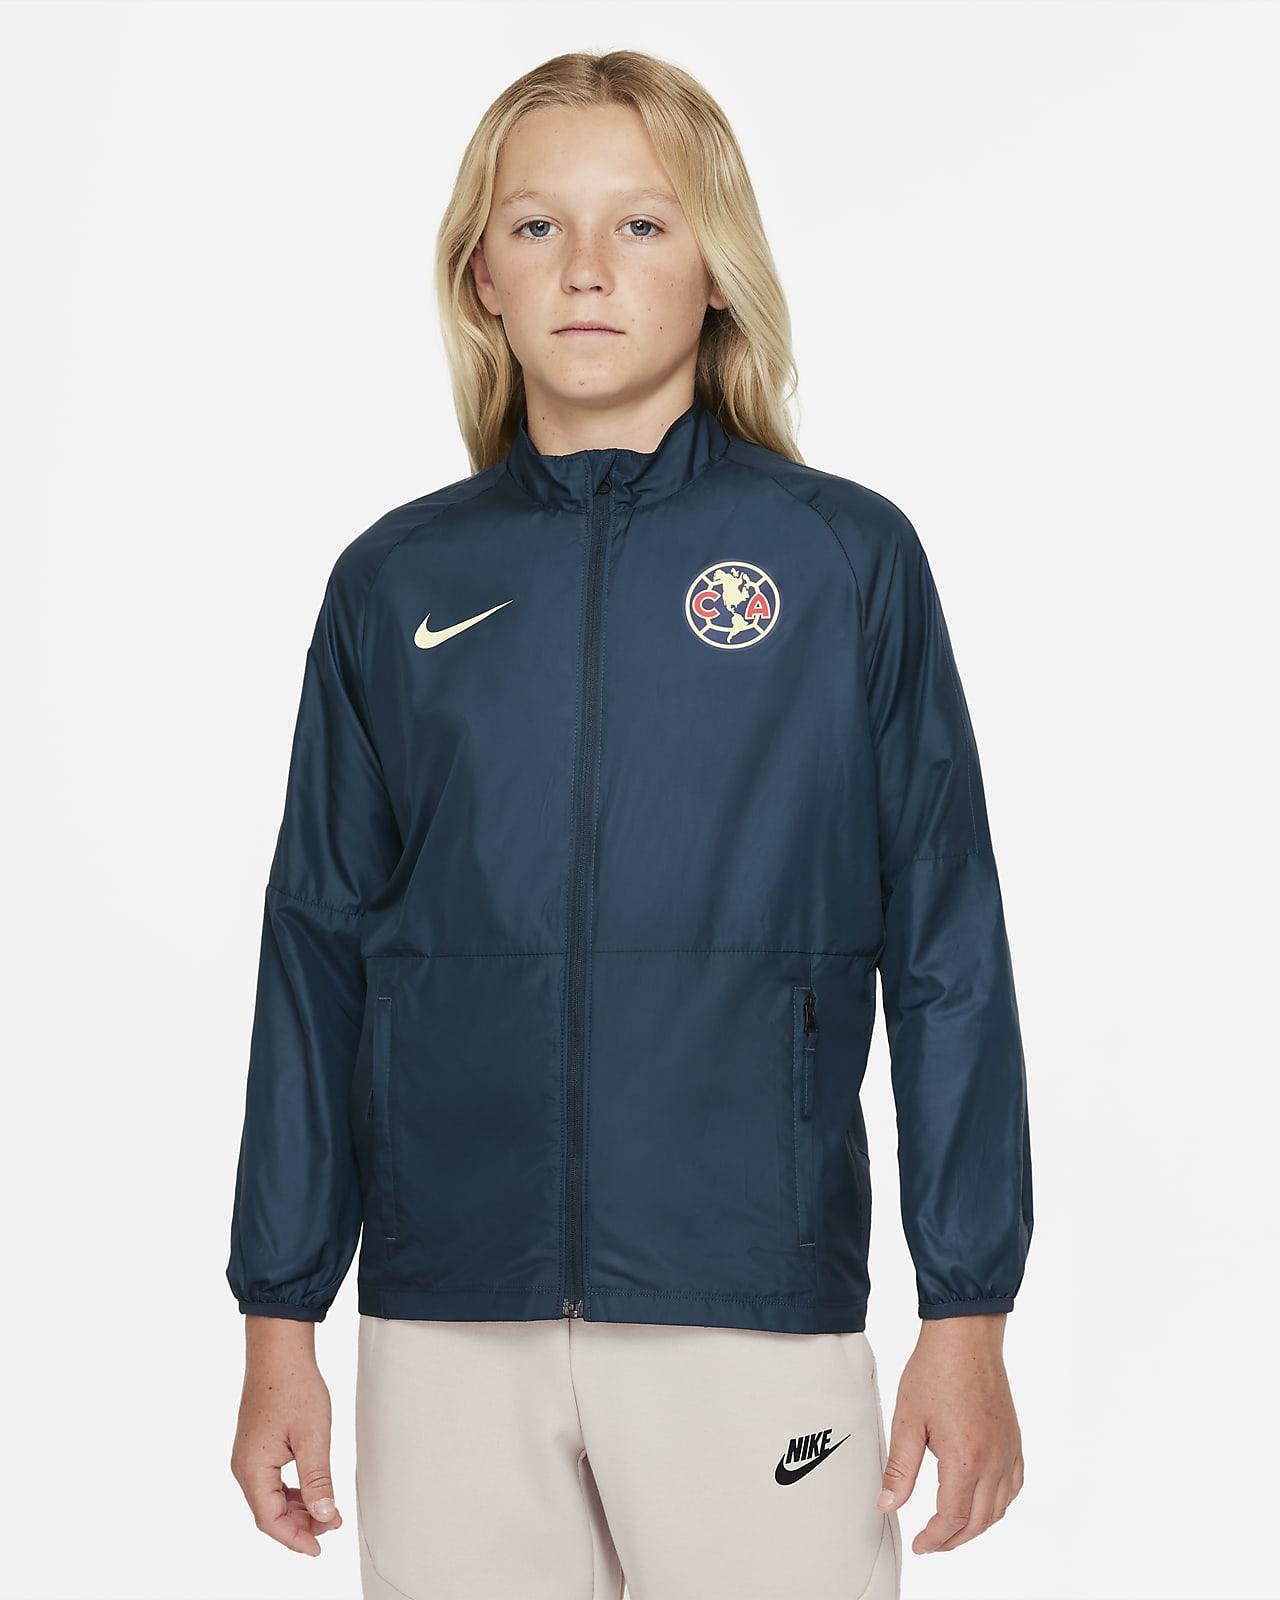 Club América Repel Academy AWF Big Kids' Soccer Jacket